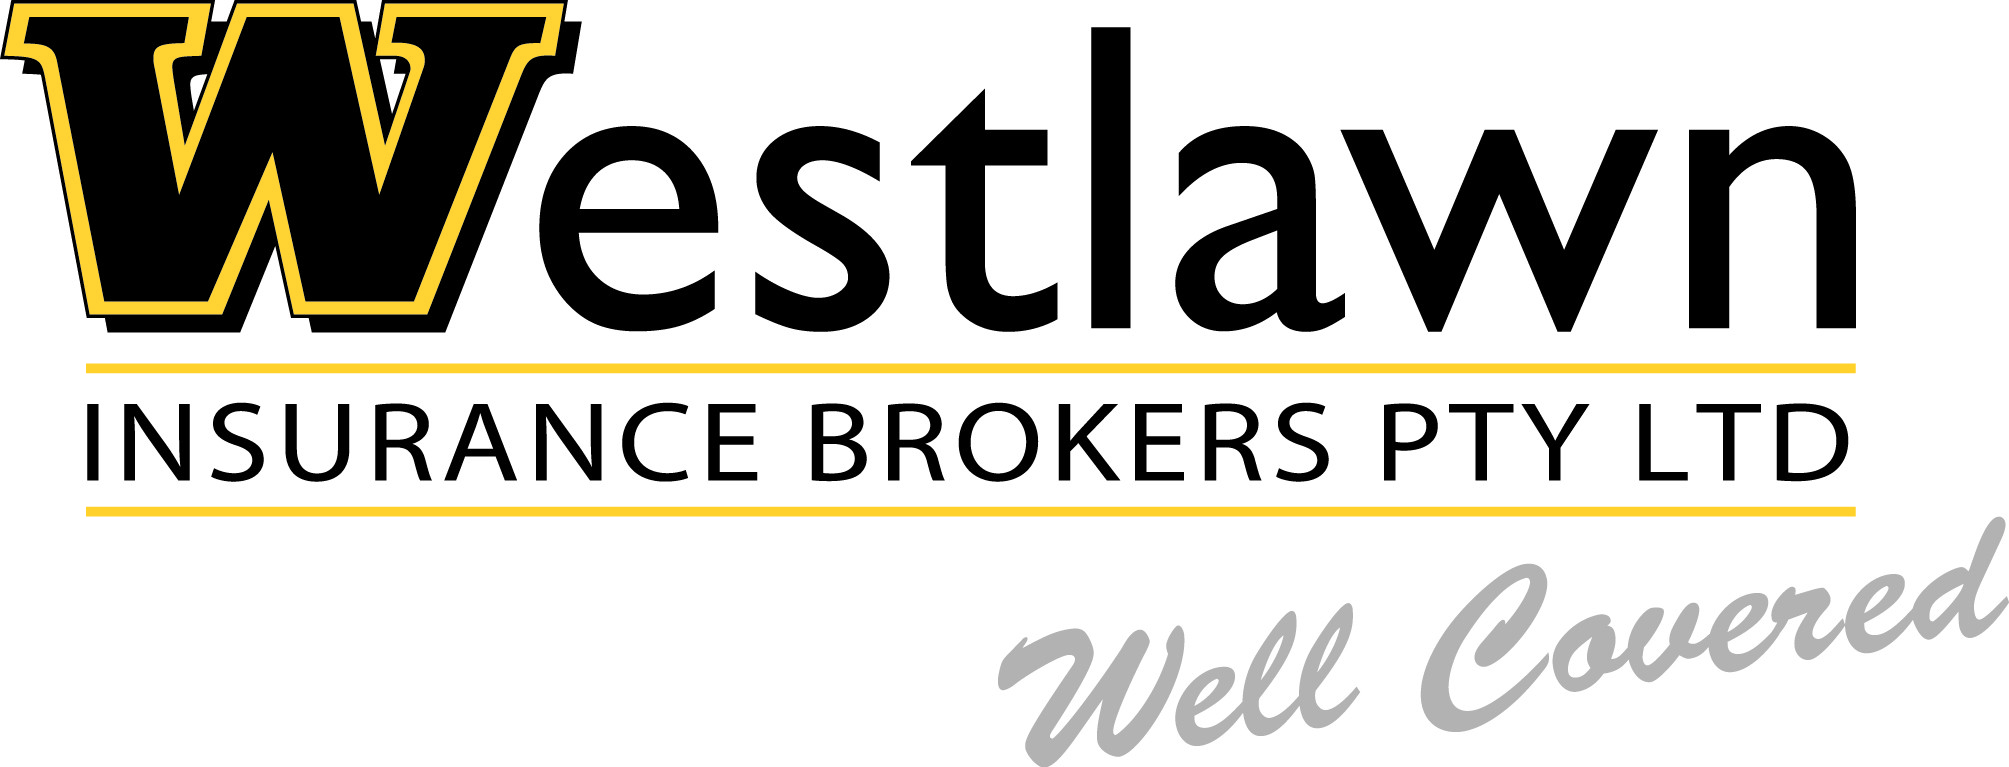 Westlawn Insurance Brokers